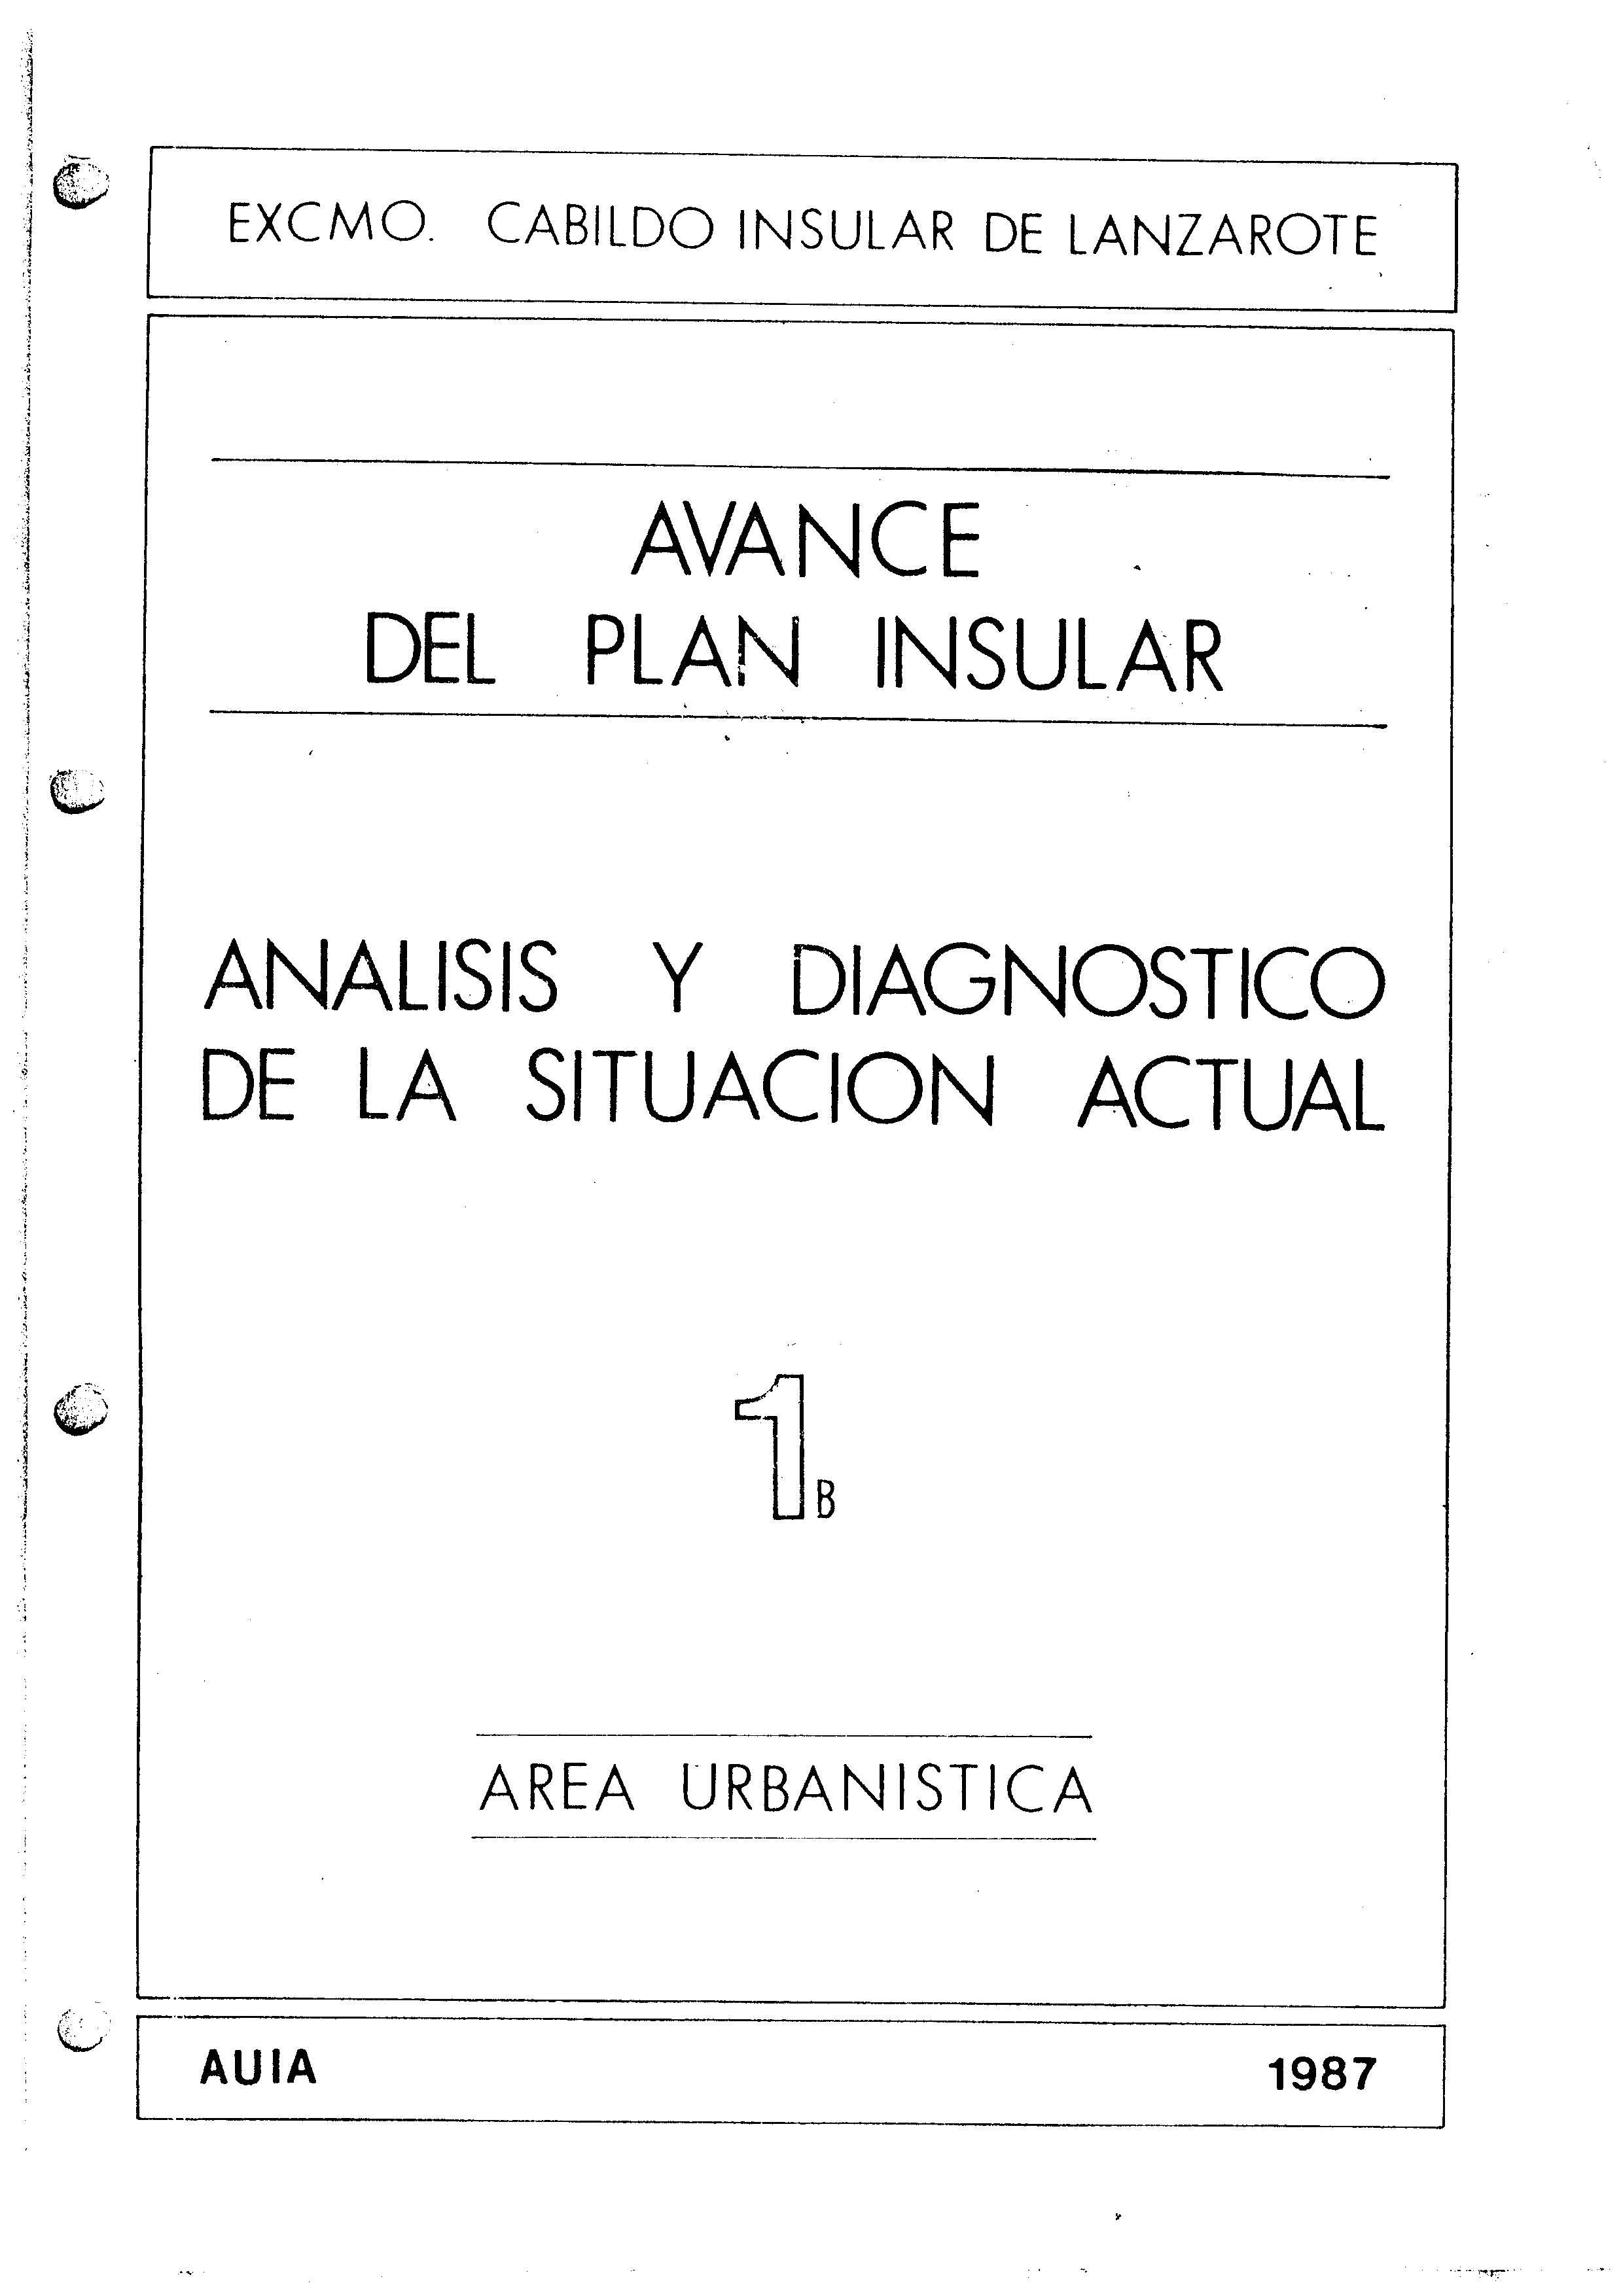 Tomo 1b. Área Urbanística. Avance Plan Insular (1987)